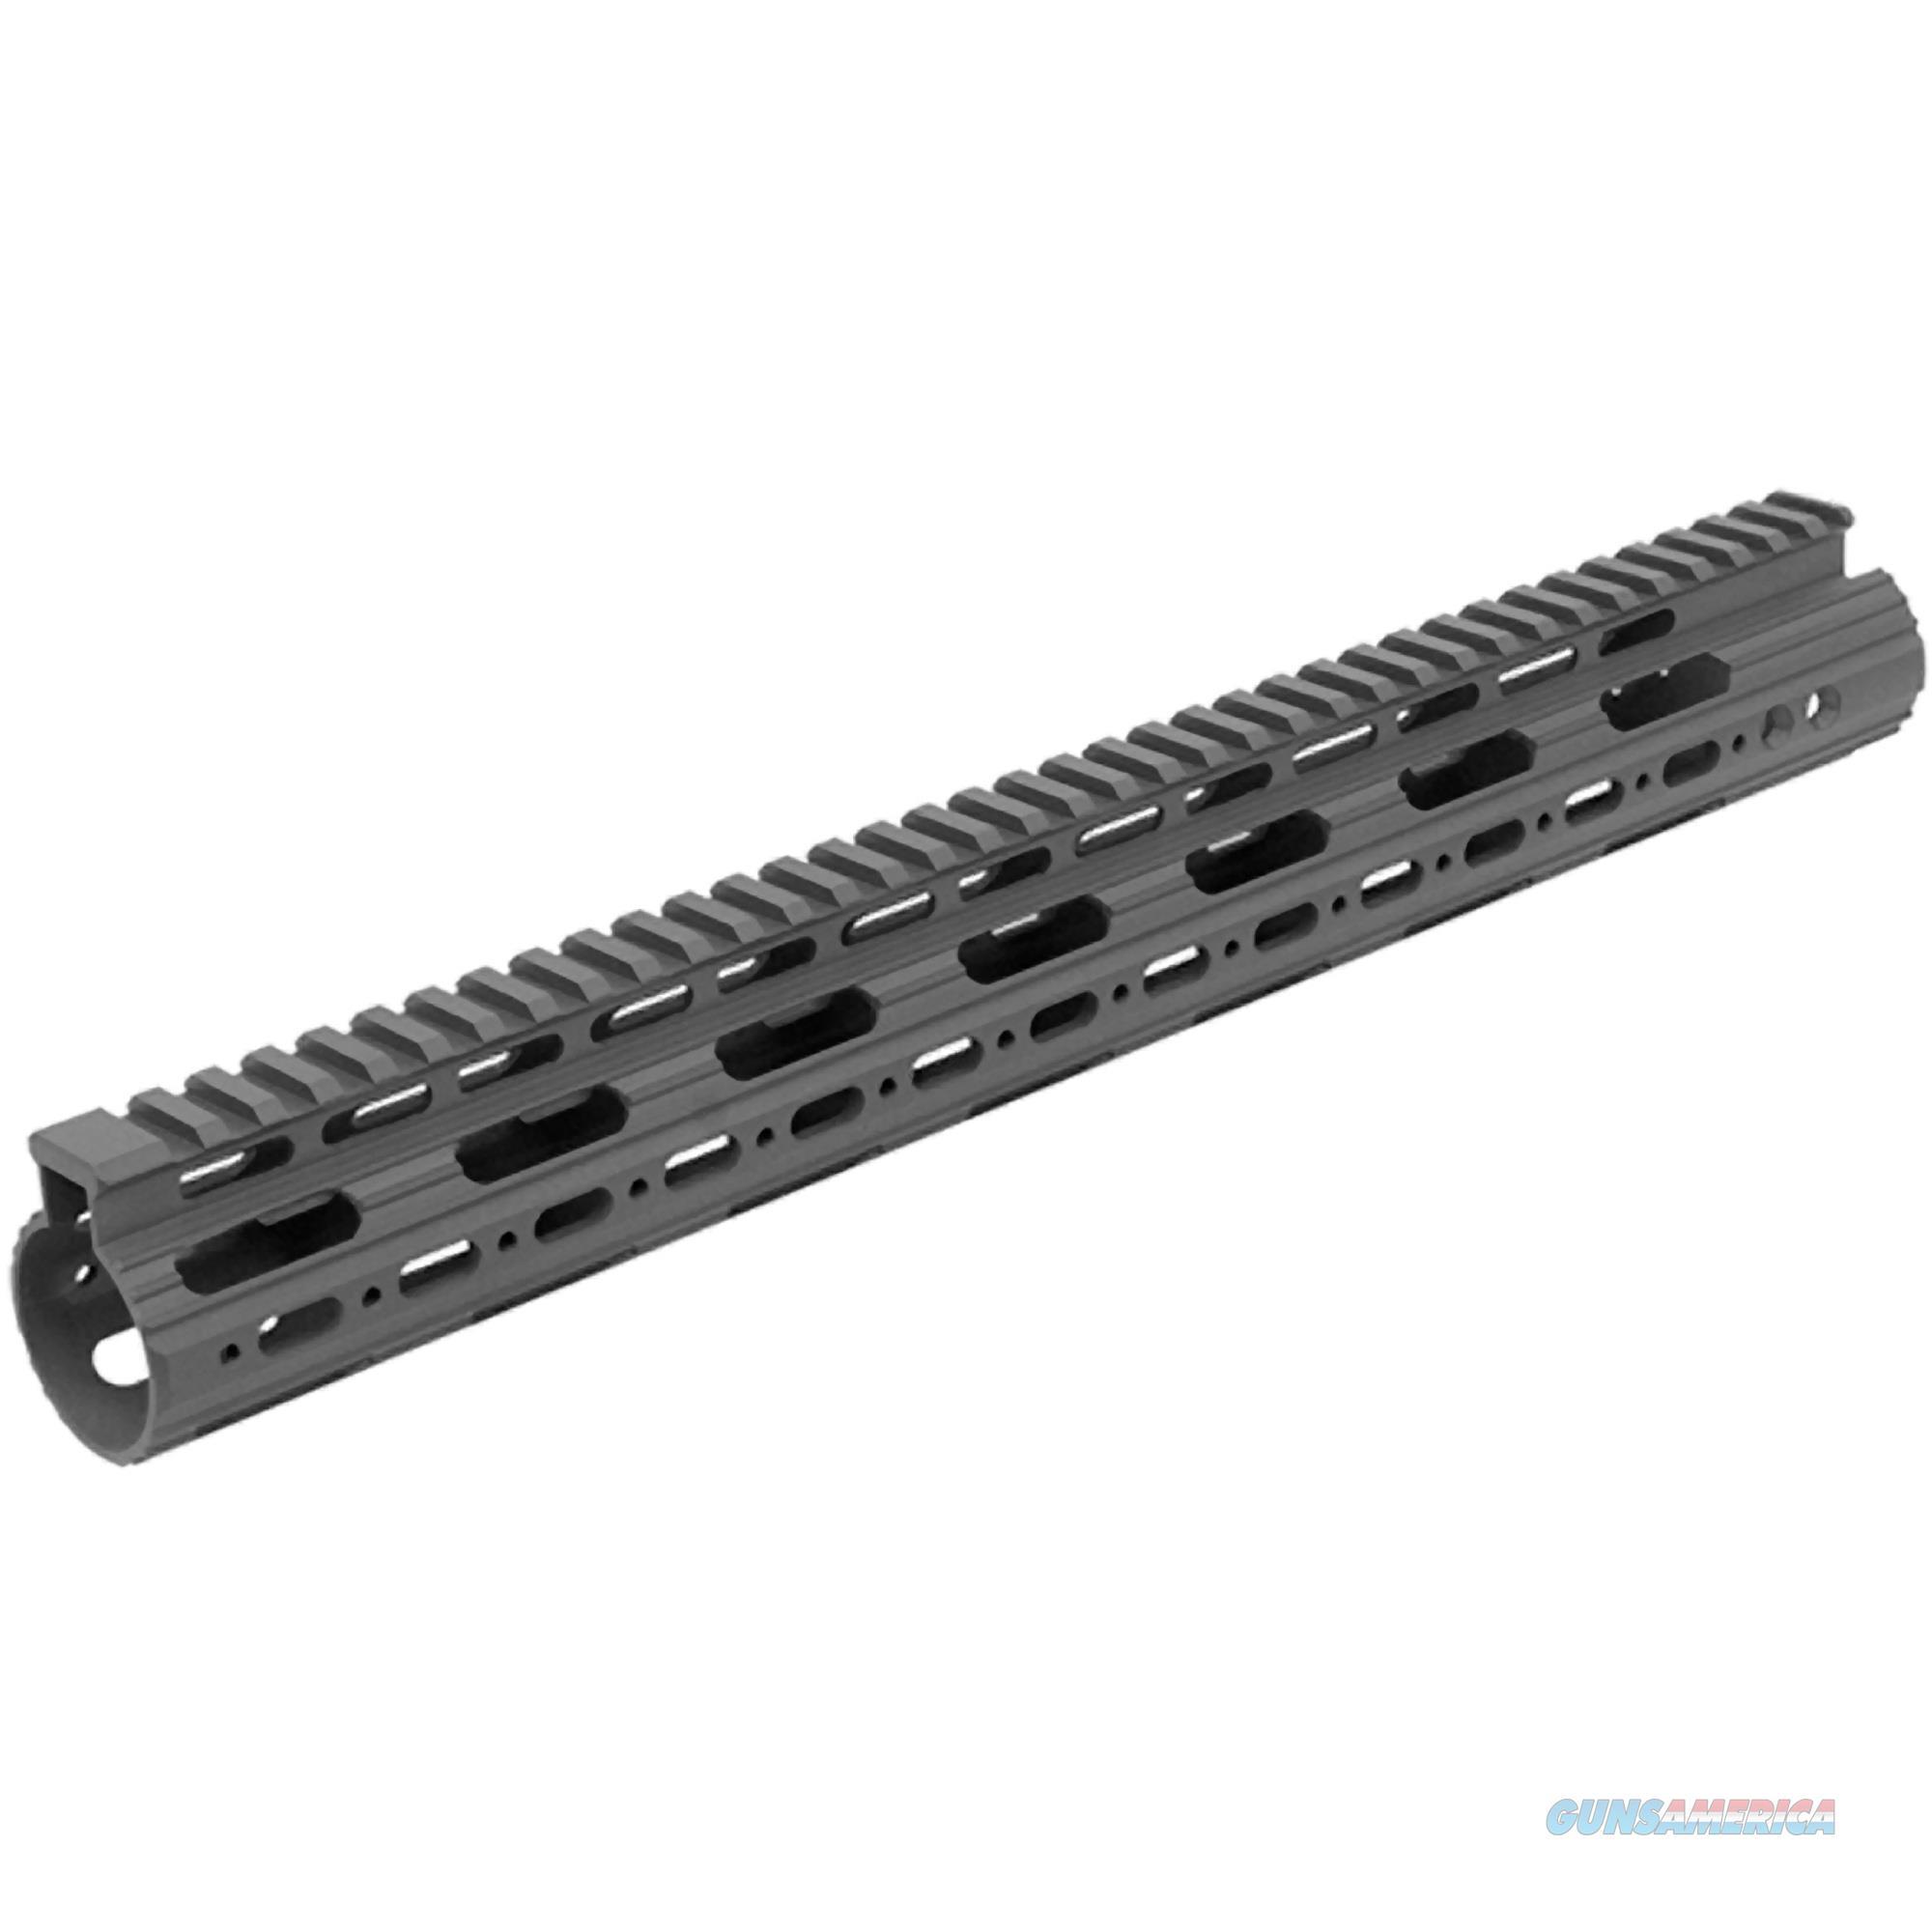 Leapers Ar15 Super Slim Free Float Handguard MTU019SS  Non-Guns > Gun Parts > Misc > Rifles